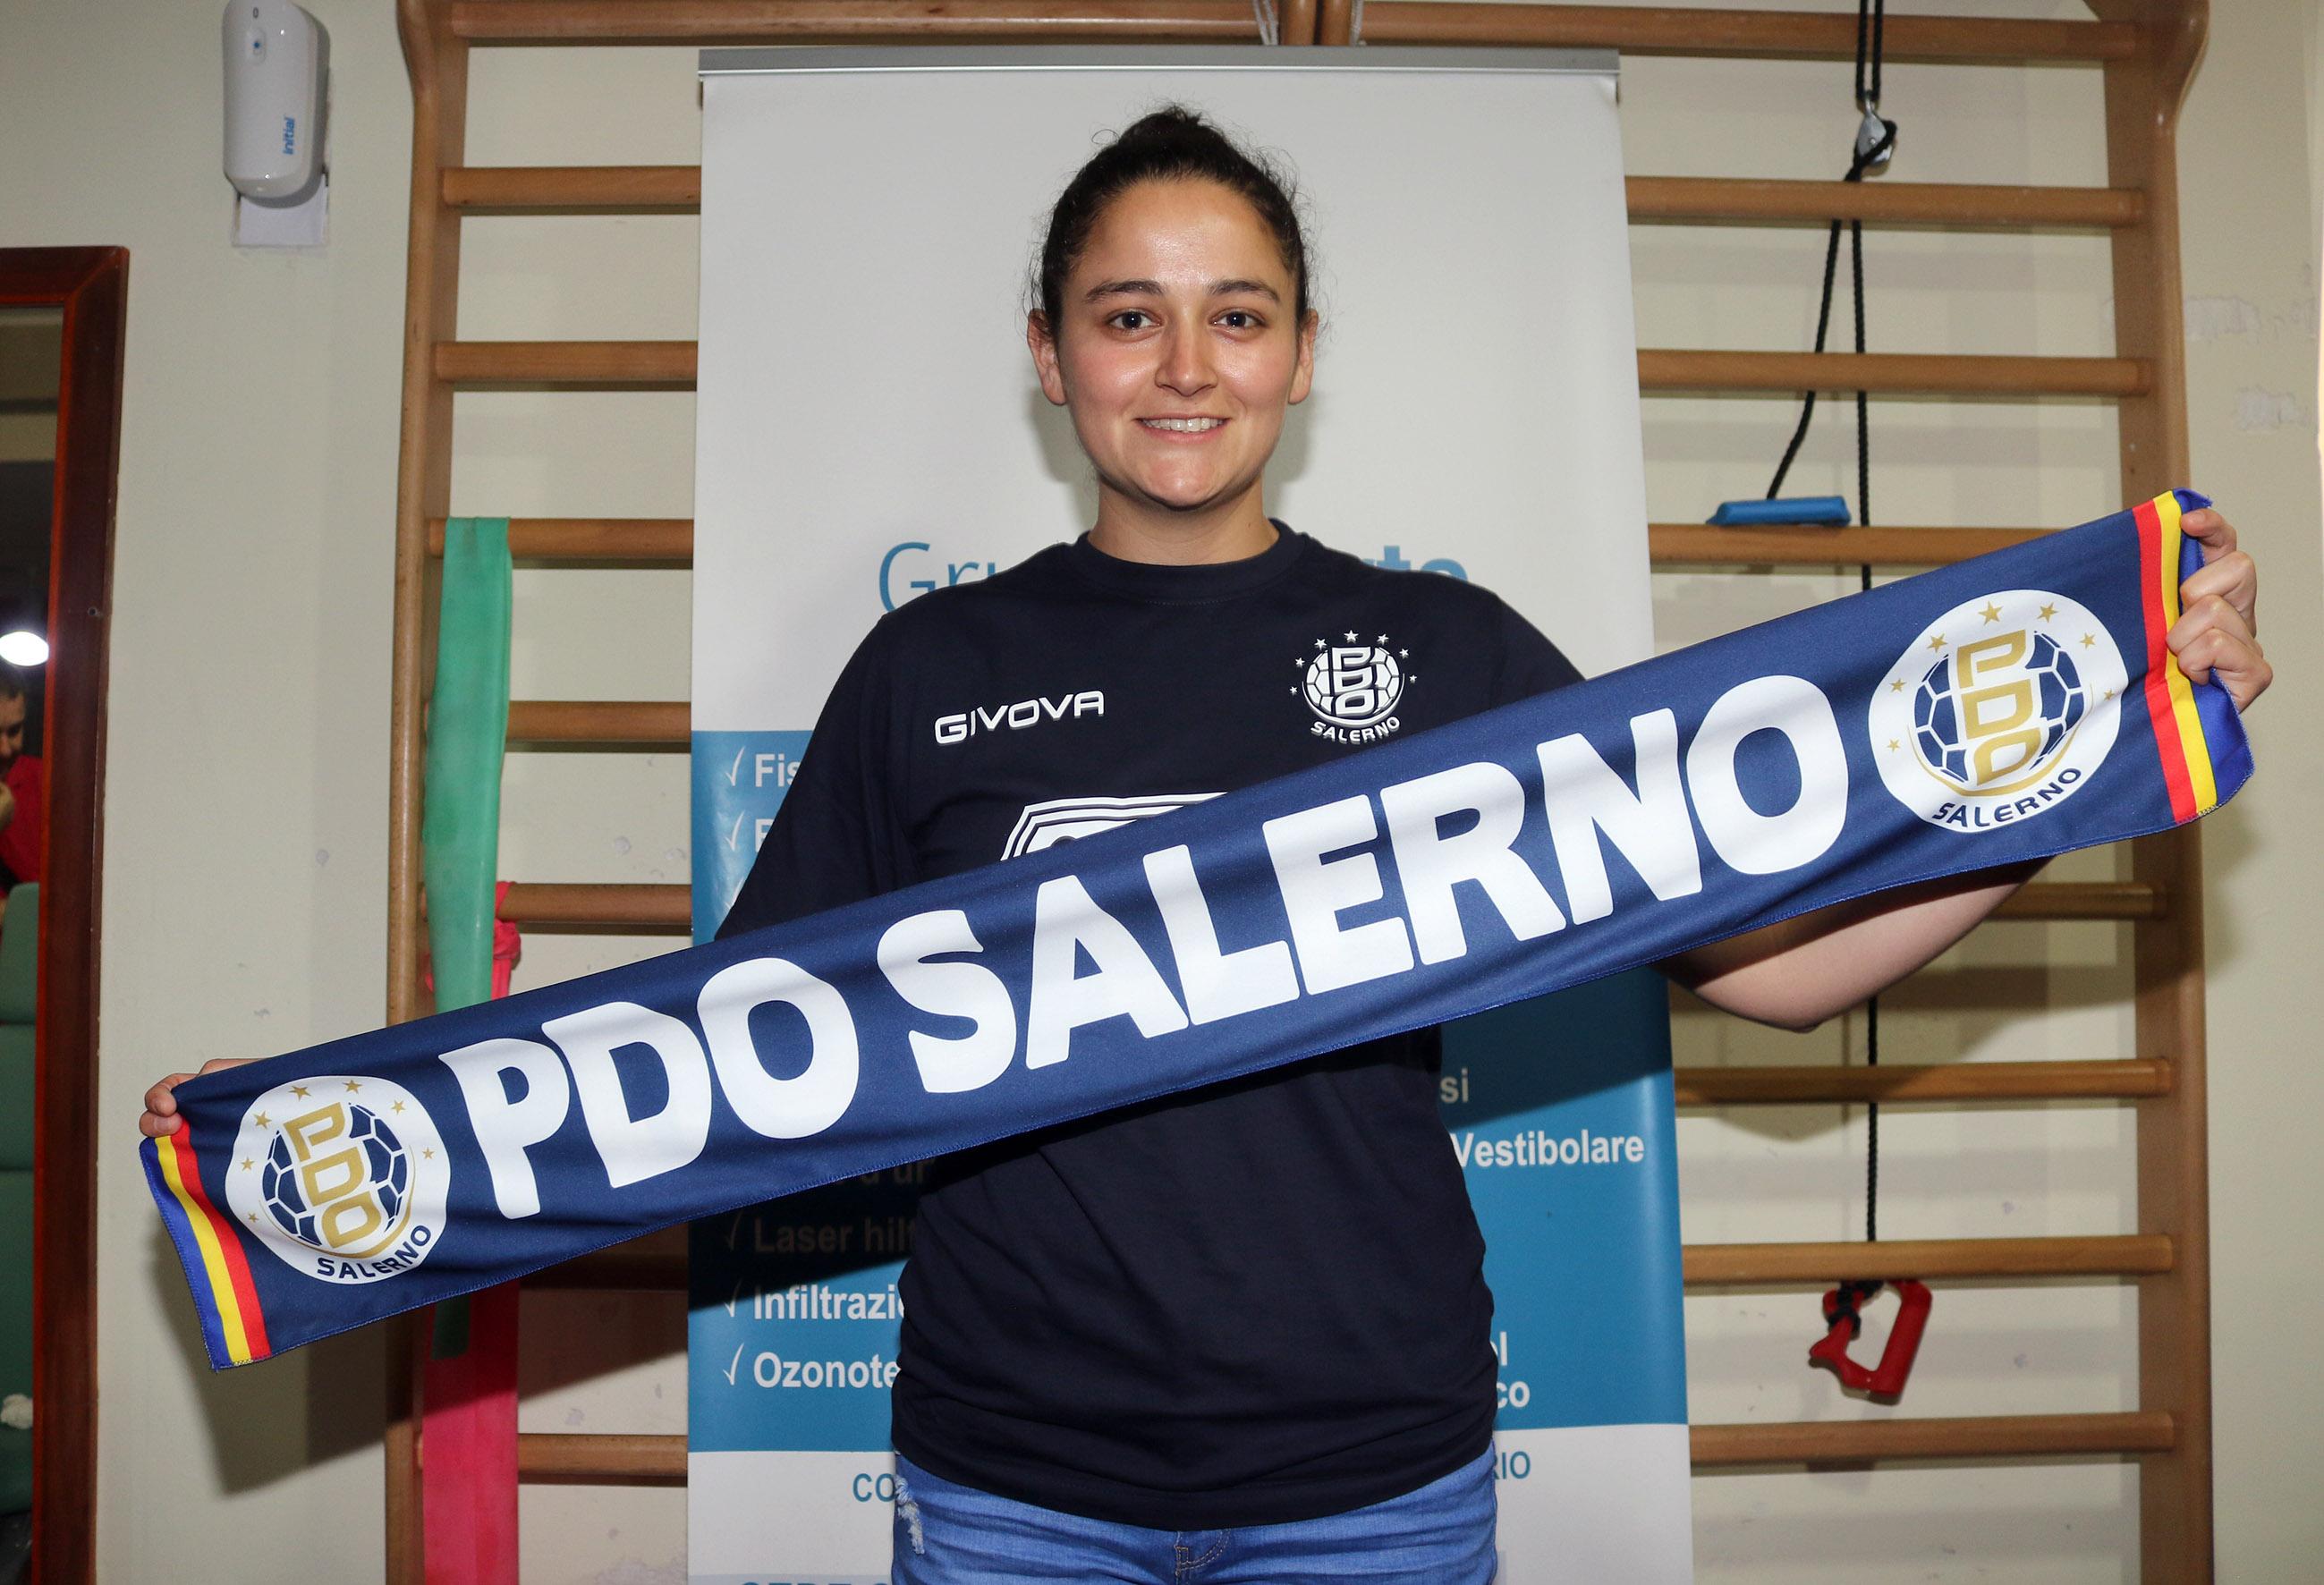 Impegno casalingo per la Jomi Salerno